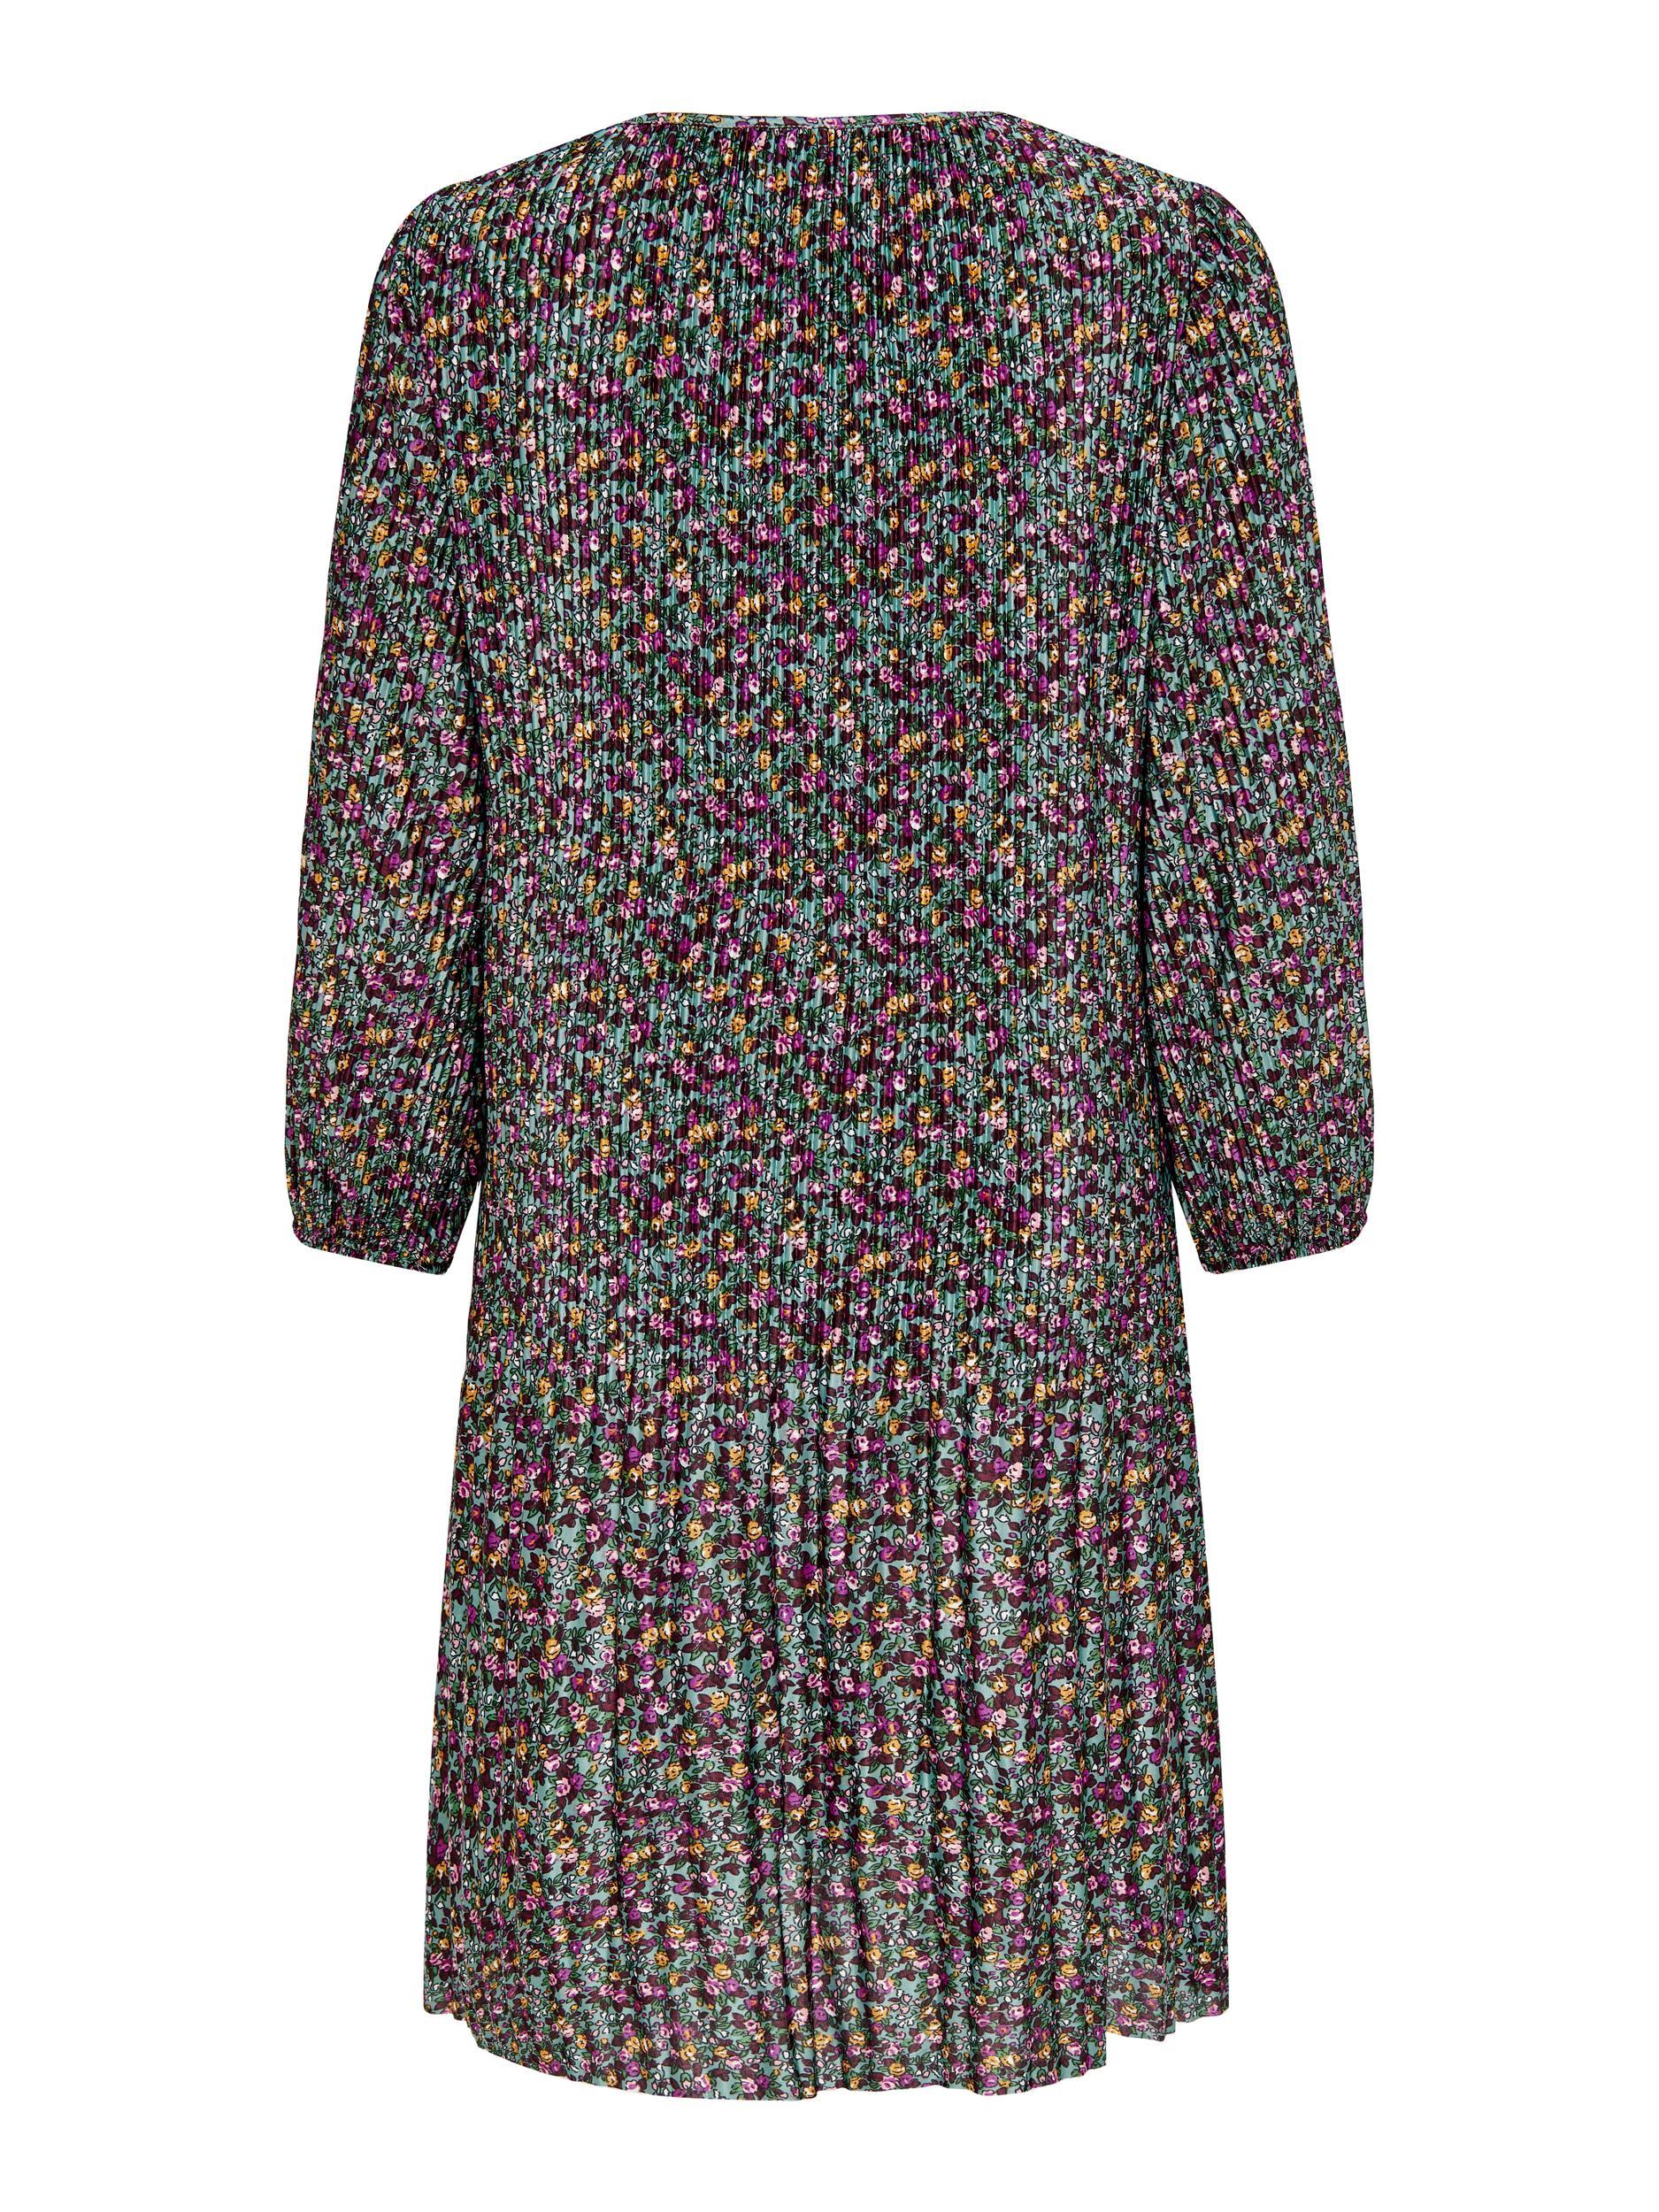 Jacqueline de Yong Boa kjole, smoke green, medium